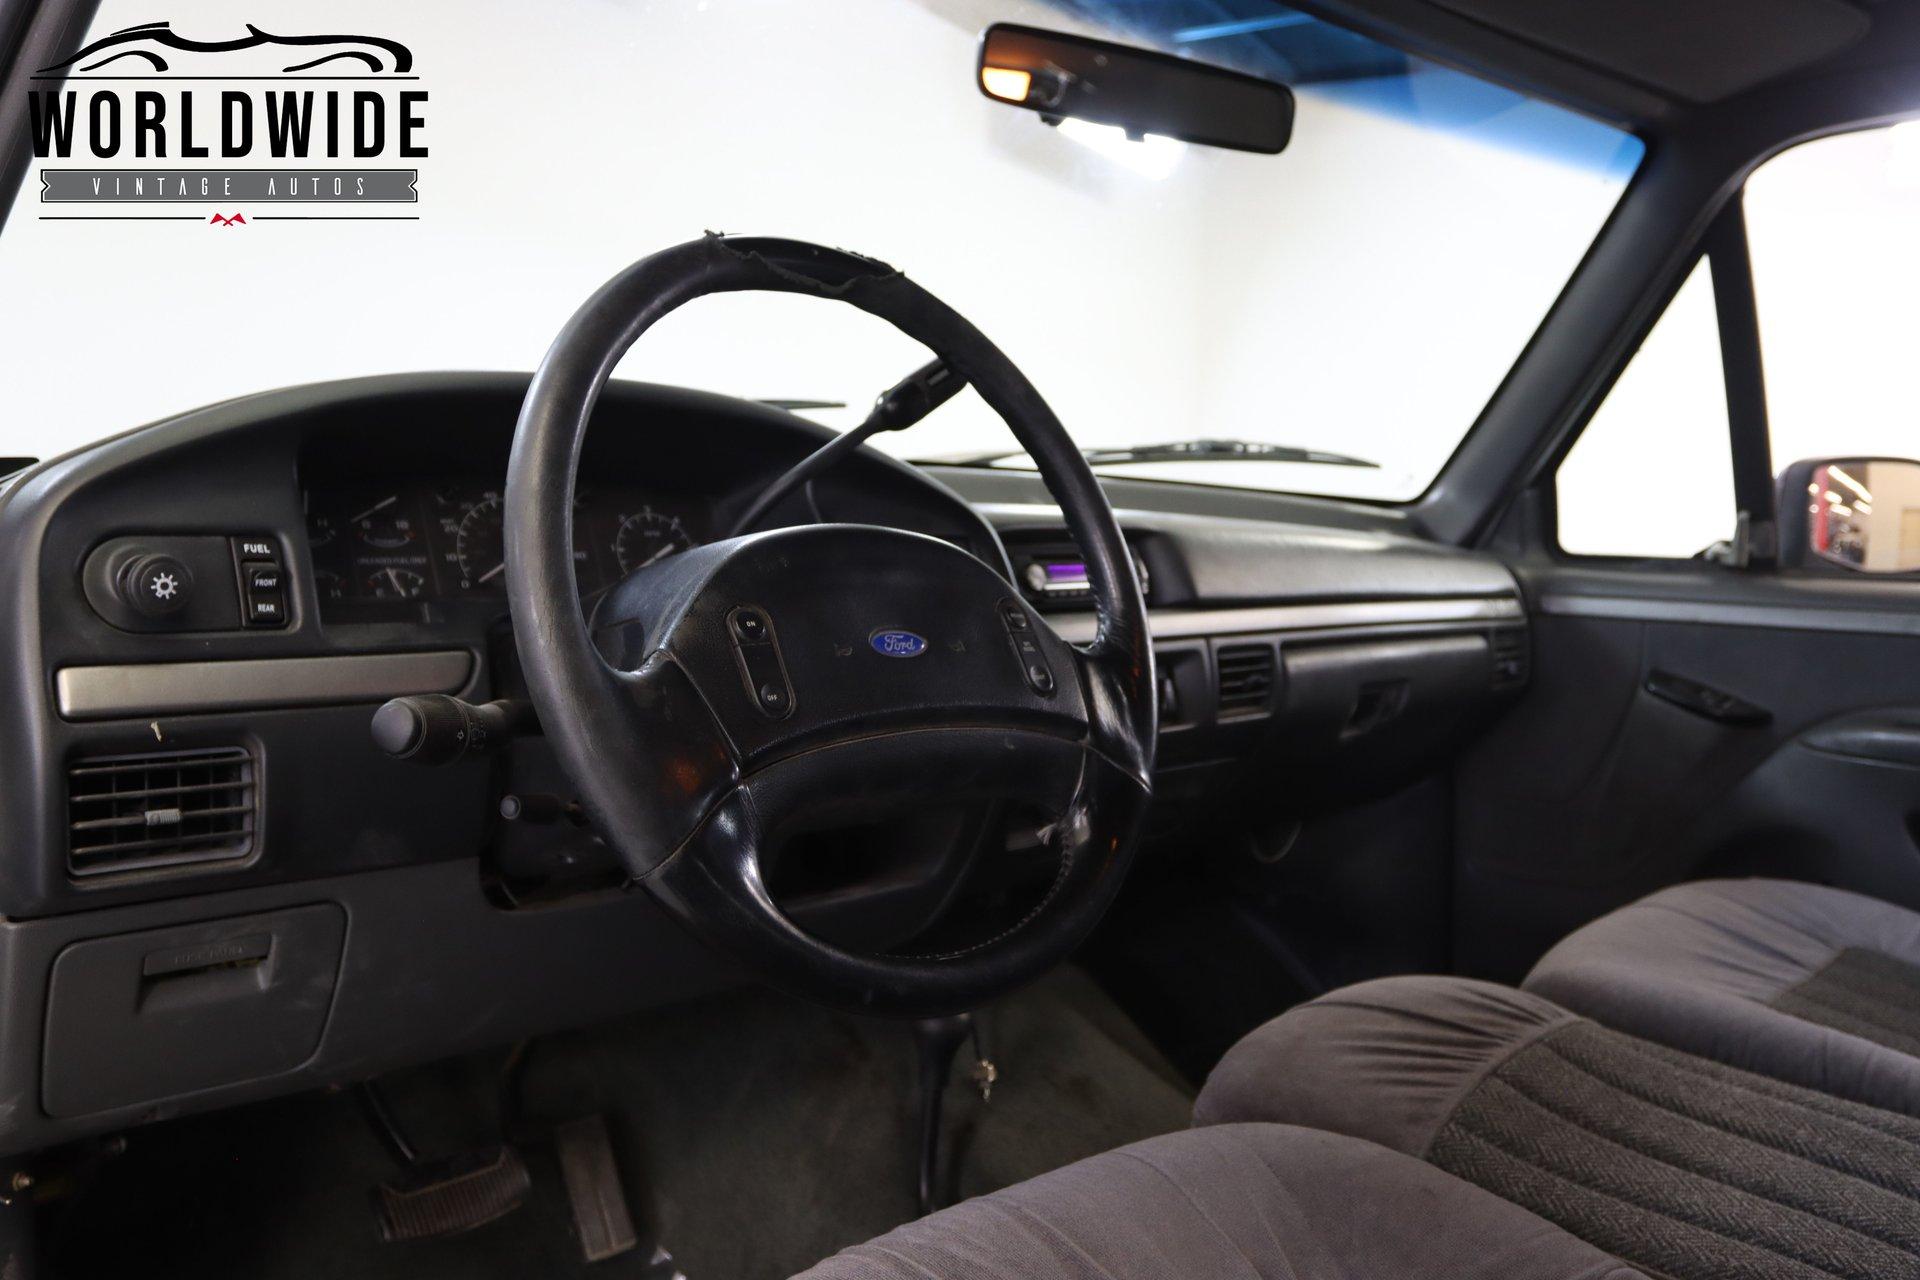 1993 Ford F-350 Crew Cab